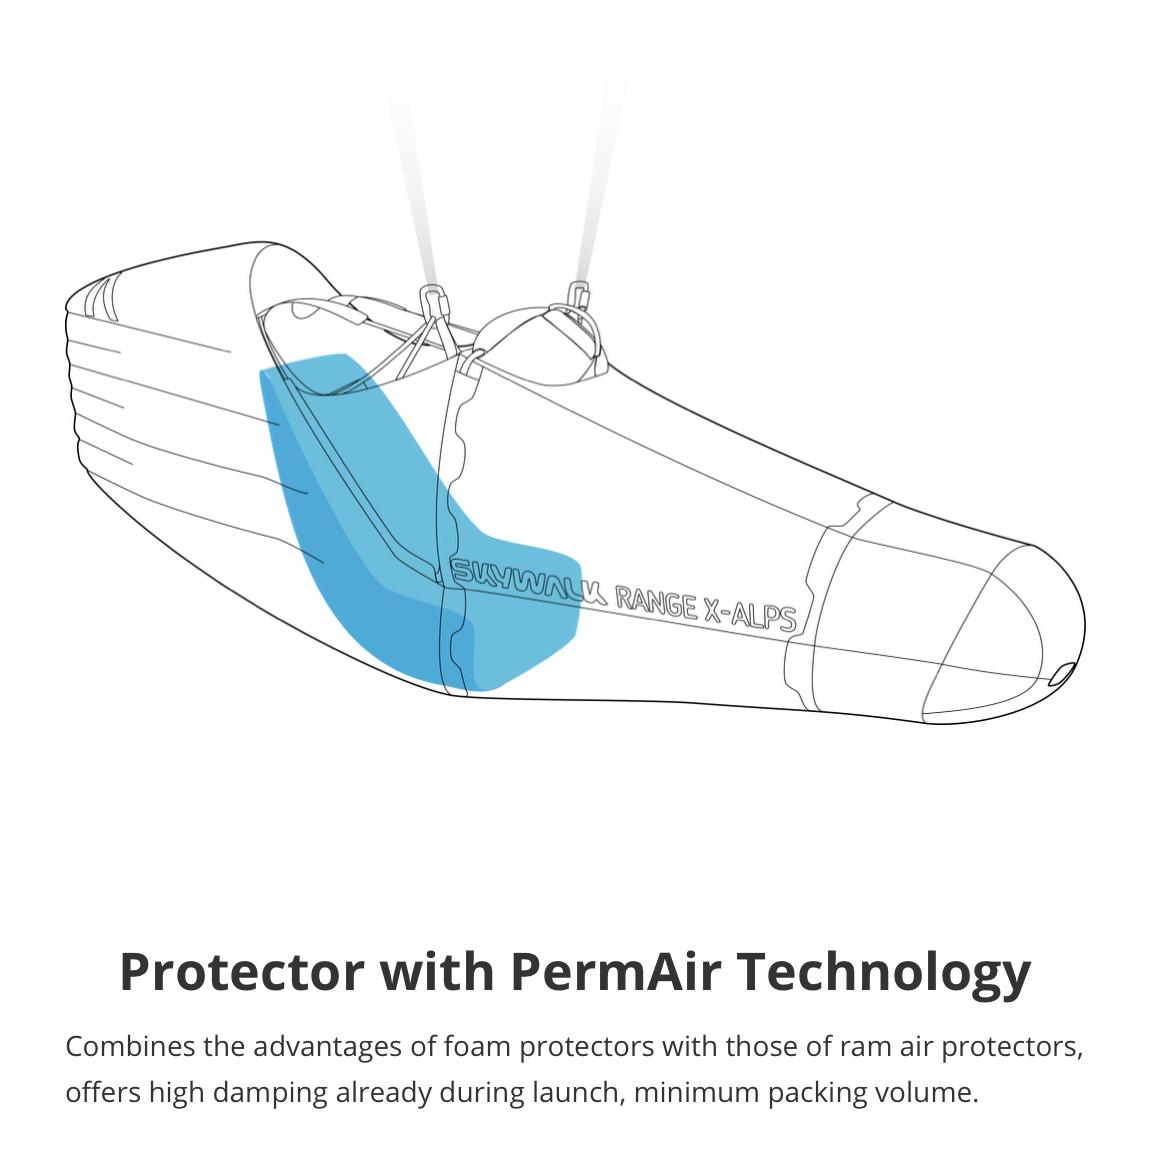 Skywalk Range X-Alps 2 - Protector with Permair Technology